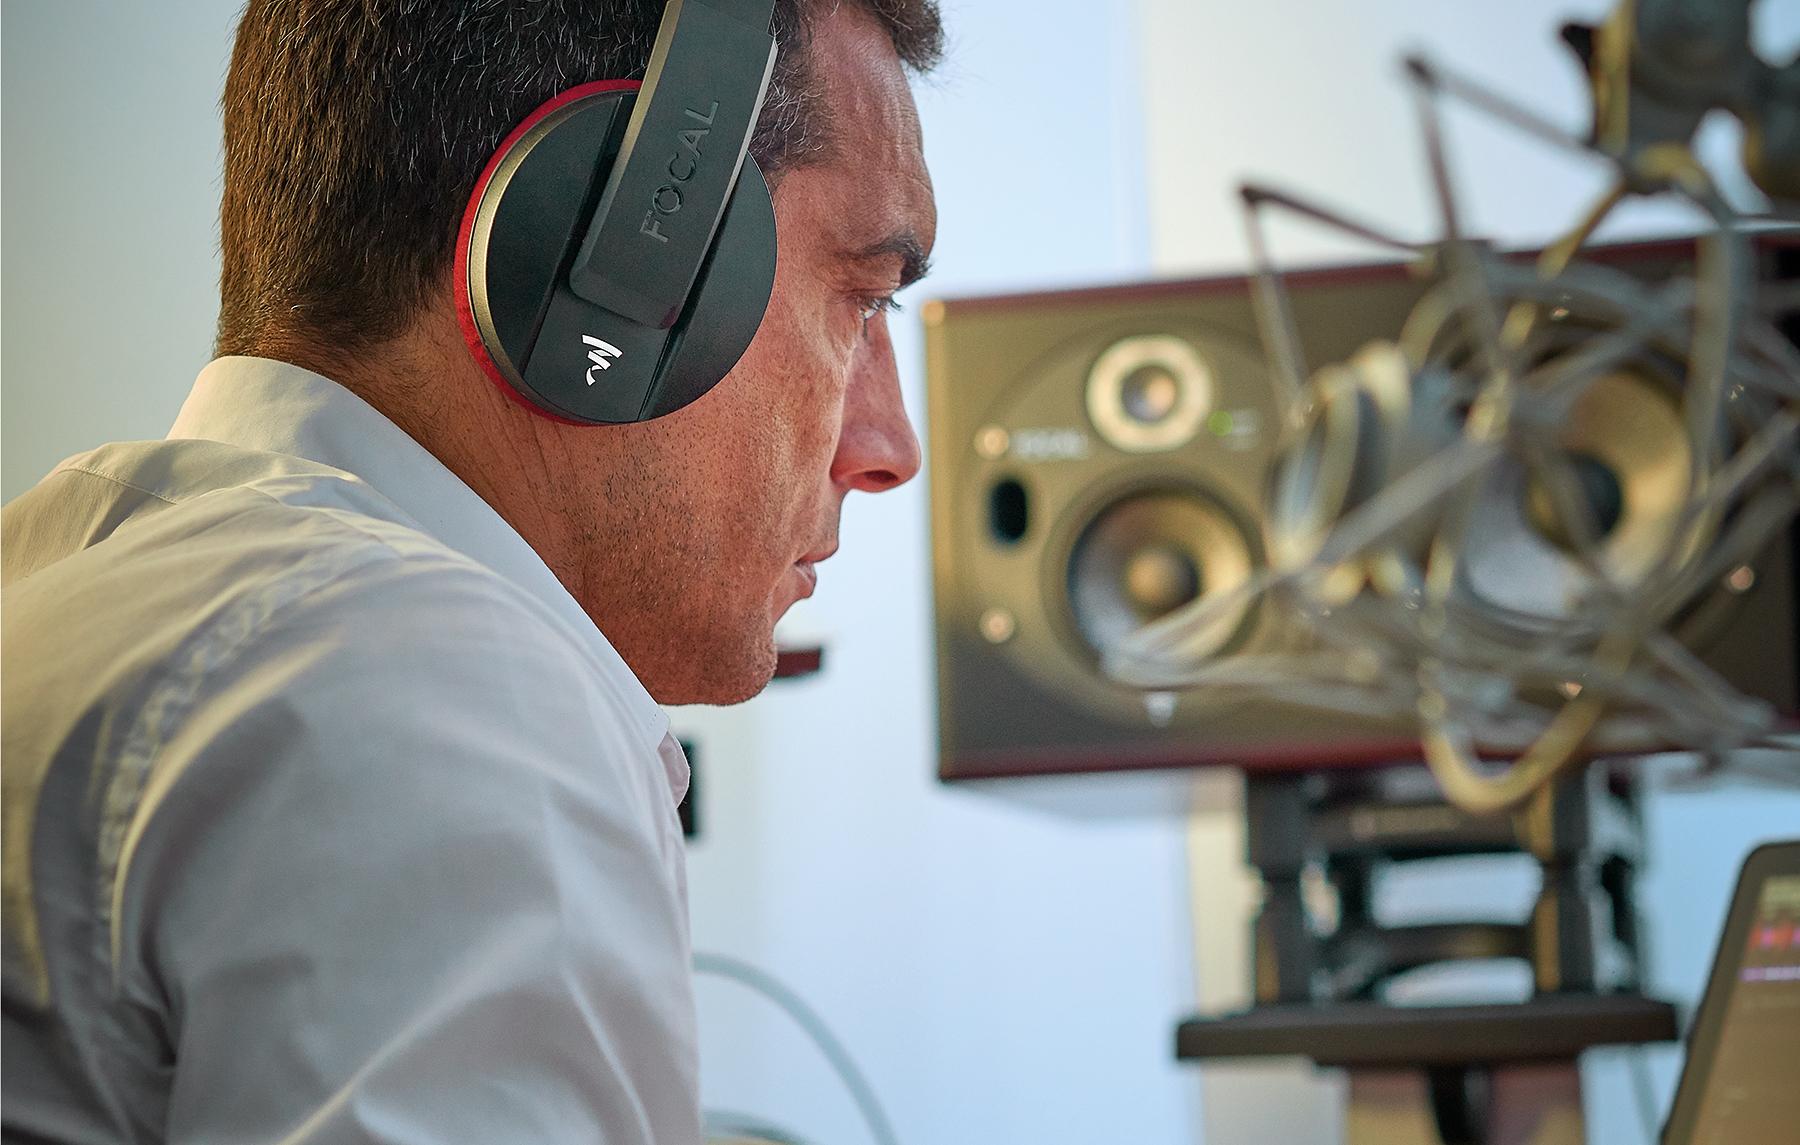 Listen Professional02